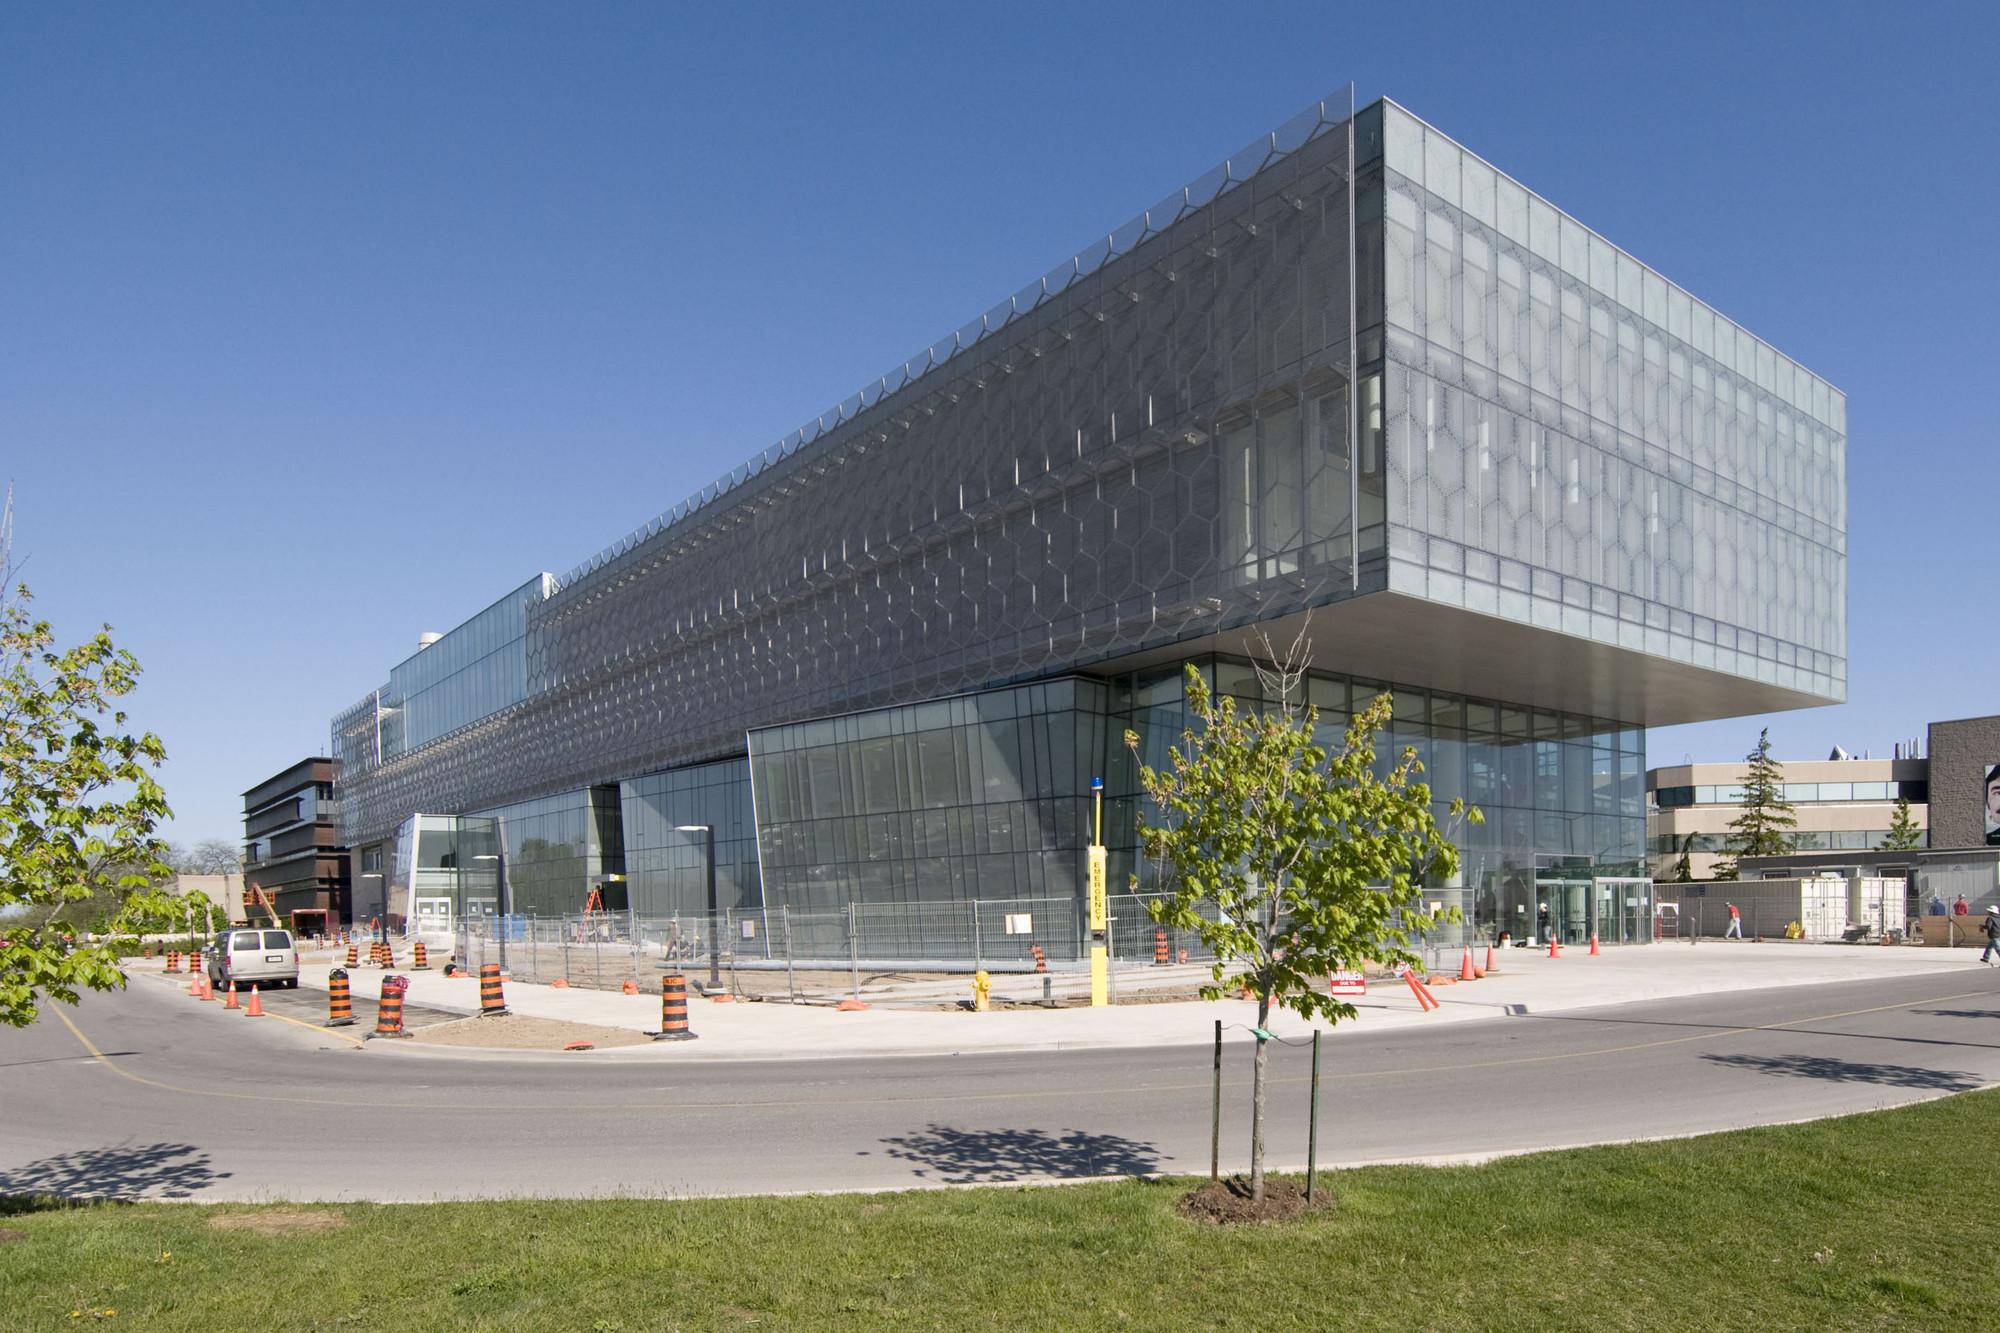 Brock University / Payette - ArchitectsAlliance, Courtesy of Payette